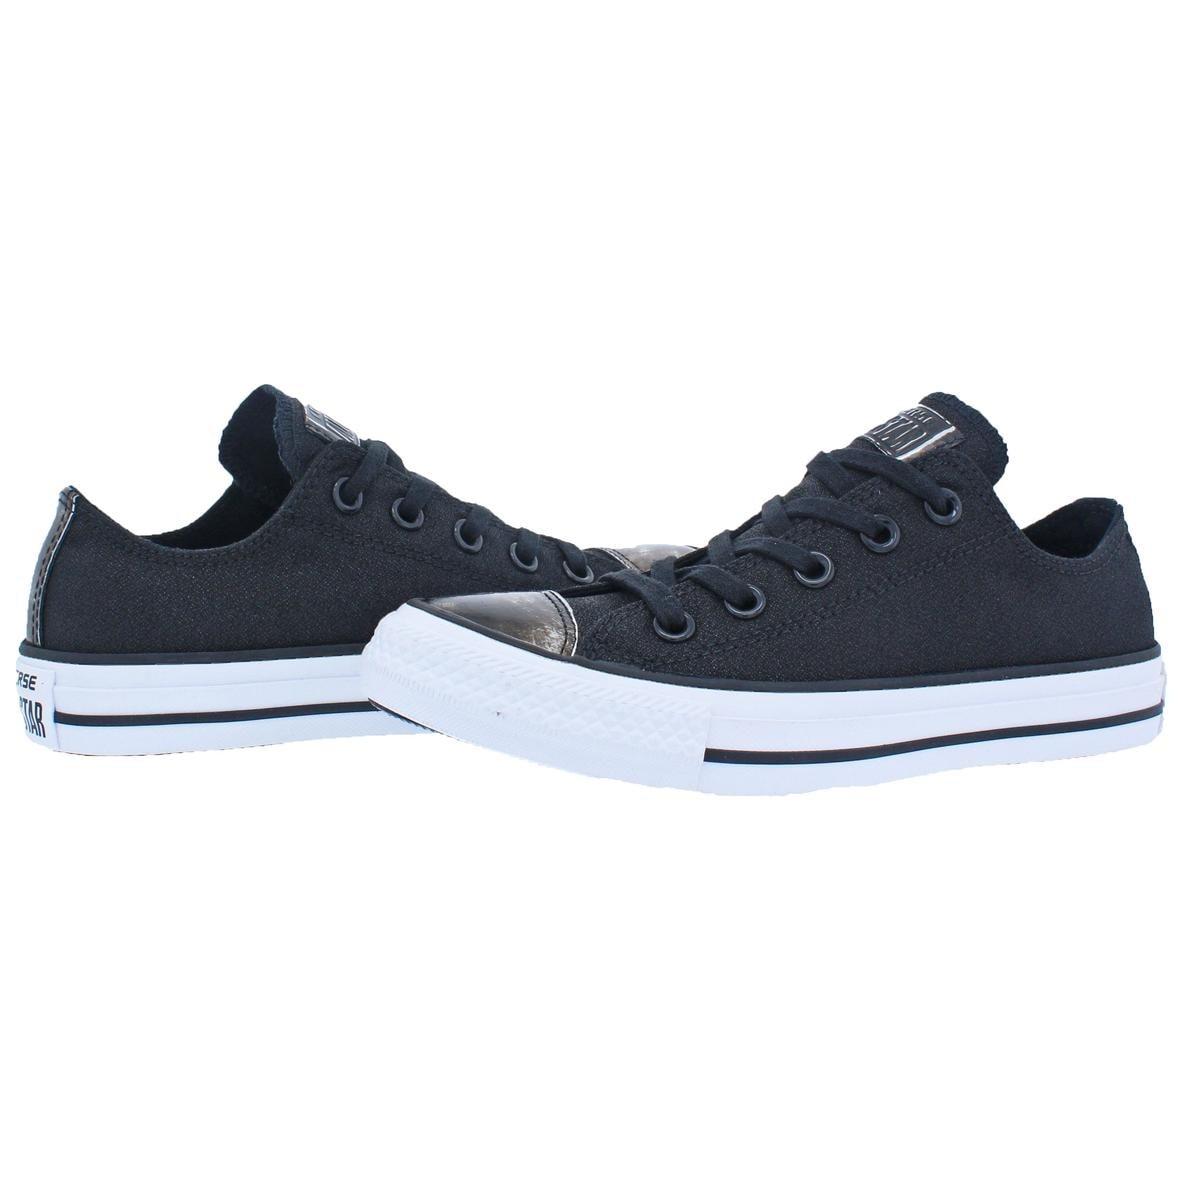 3f3a77d59dc Shop Converse Womens Fashion Sneakers Low Top Casual - 5 Medium (B